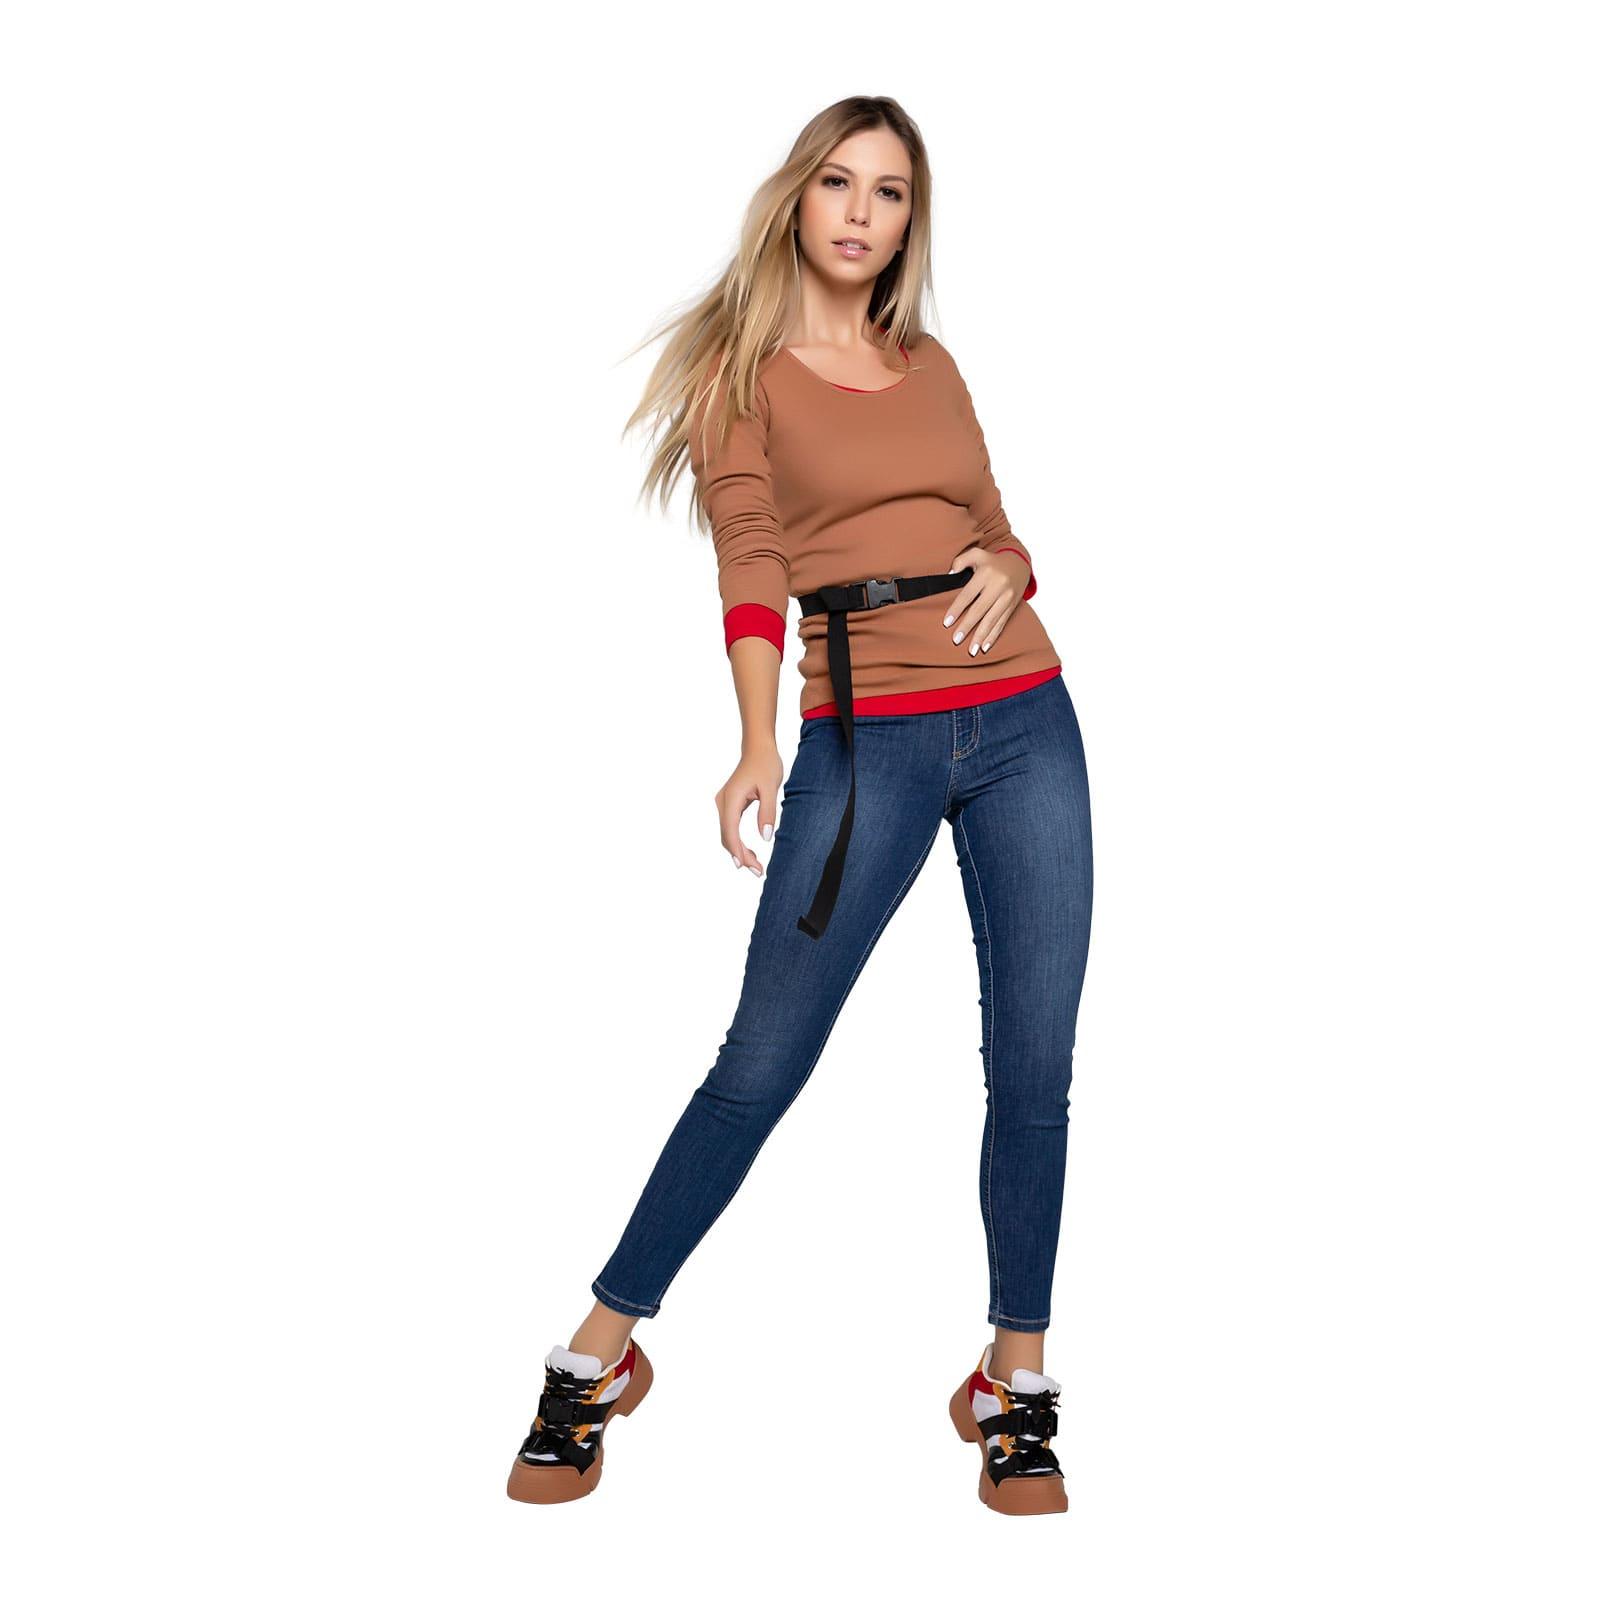 Calça Jeans Feminina Tradicional Cropped